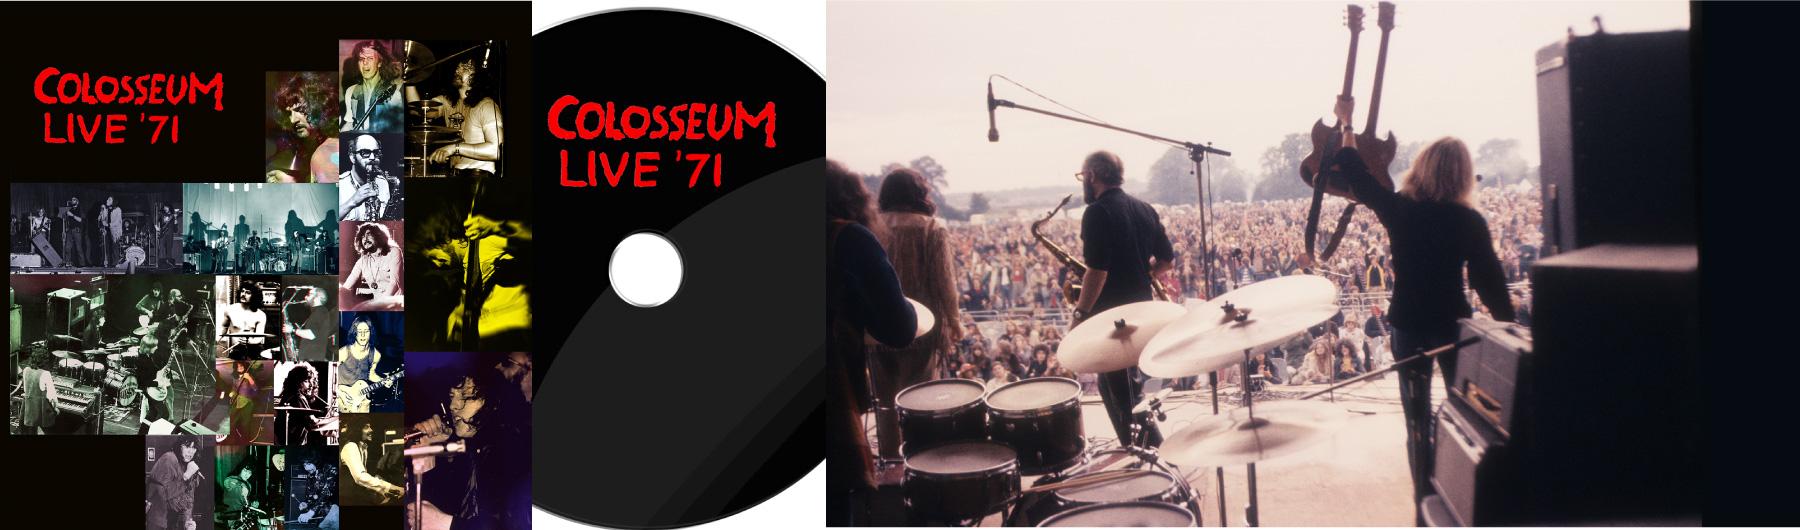 Colosseum – Live '71 Canterbury, Brighton & Manchester Packshot